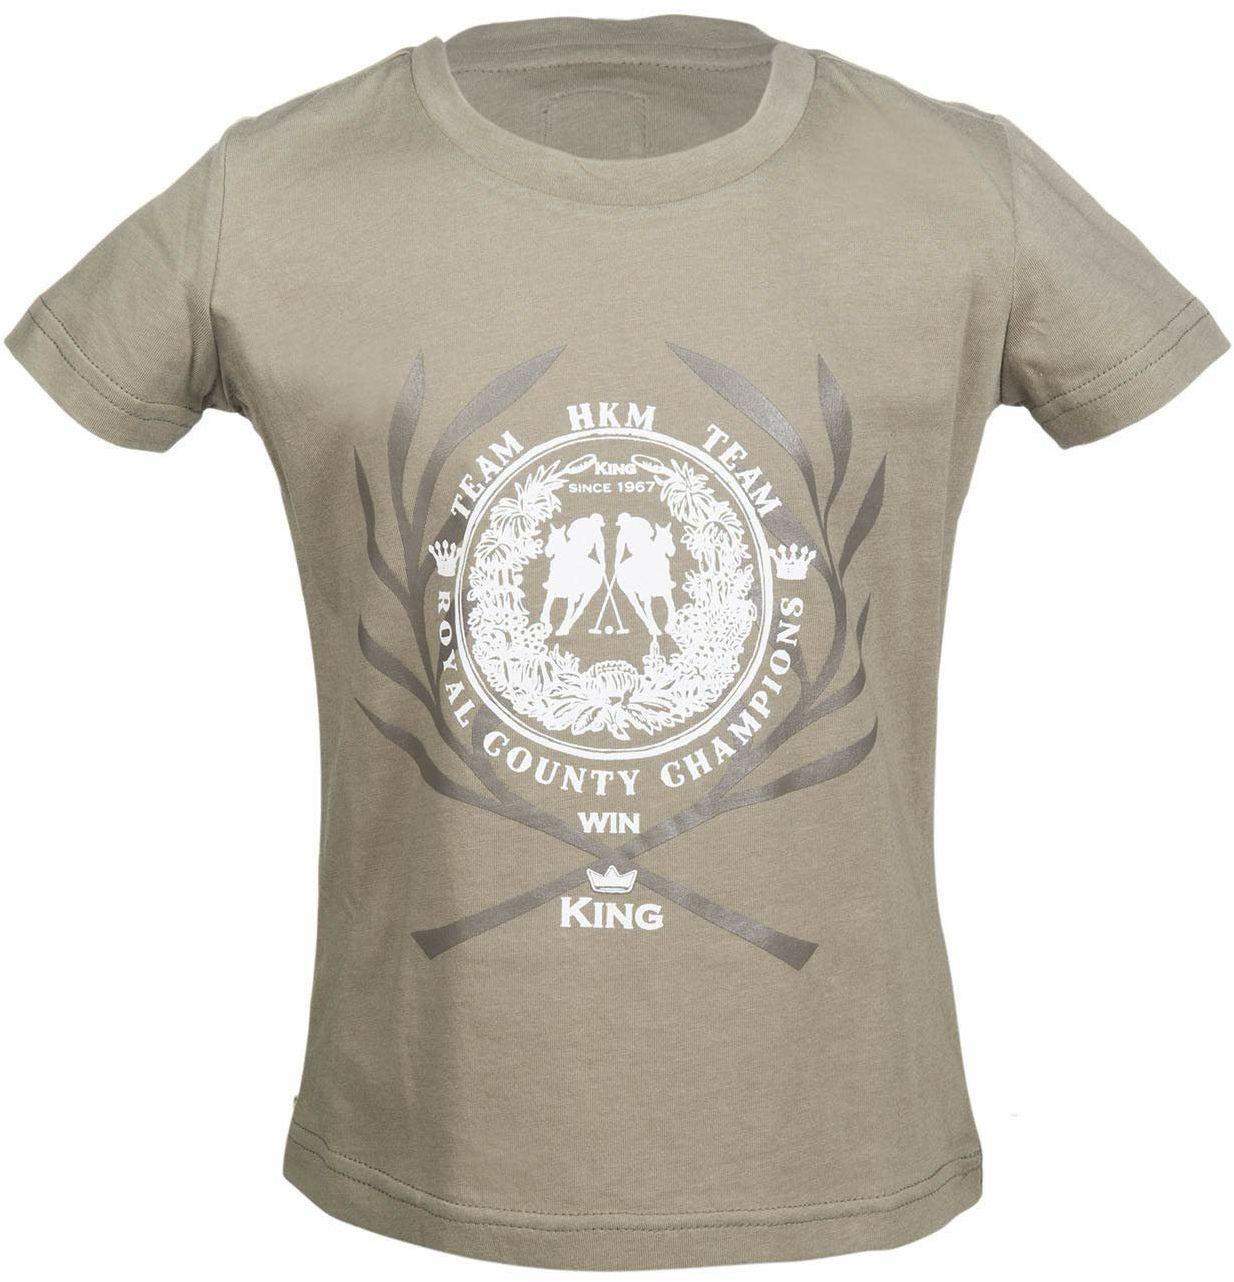 HKM Unisex spodnie T-shirt -San Luis-2500 niebieski 2500 Beige 110-116